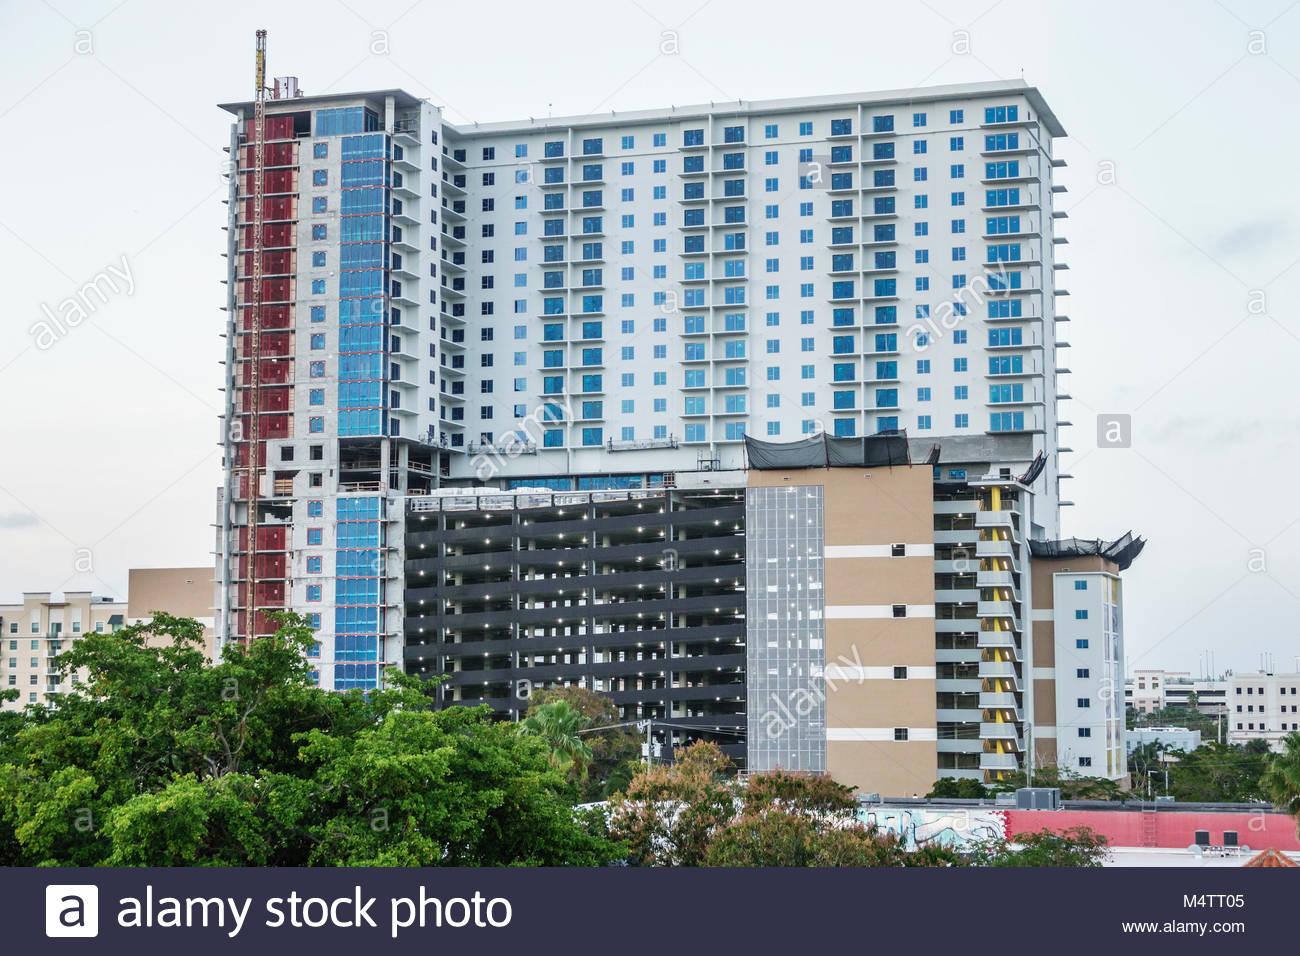 New Apartment Construction West Palm Beach